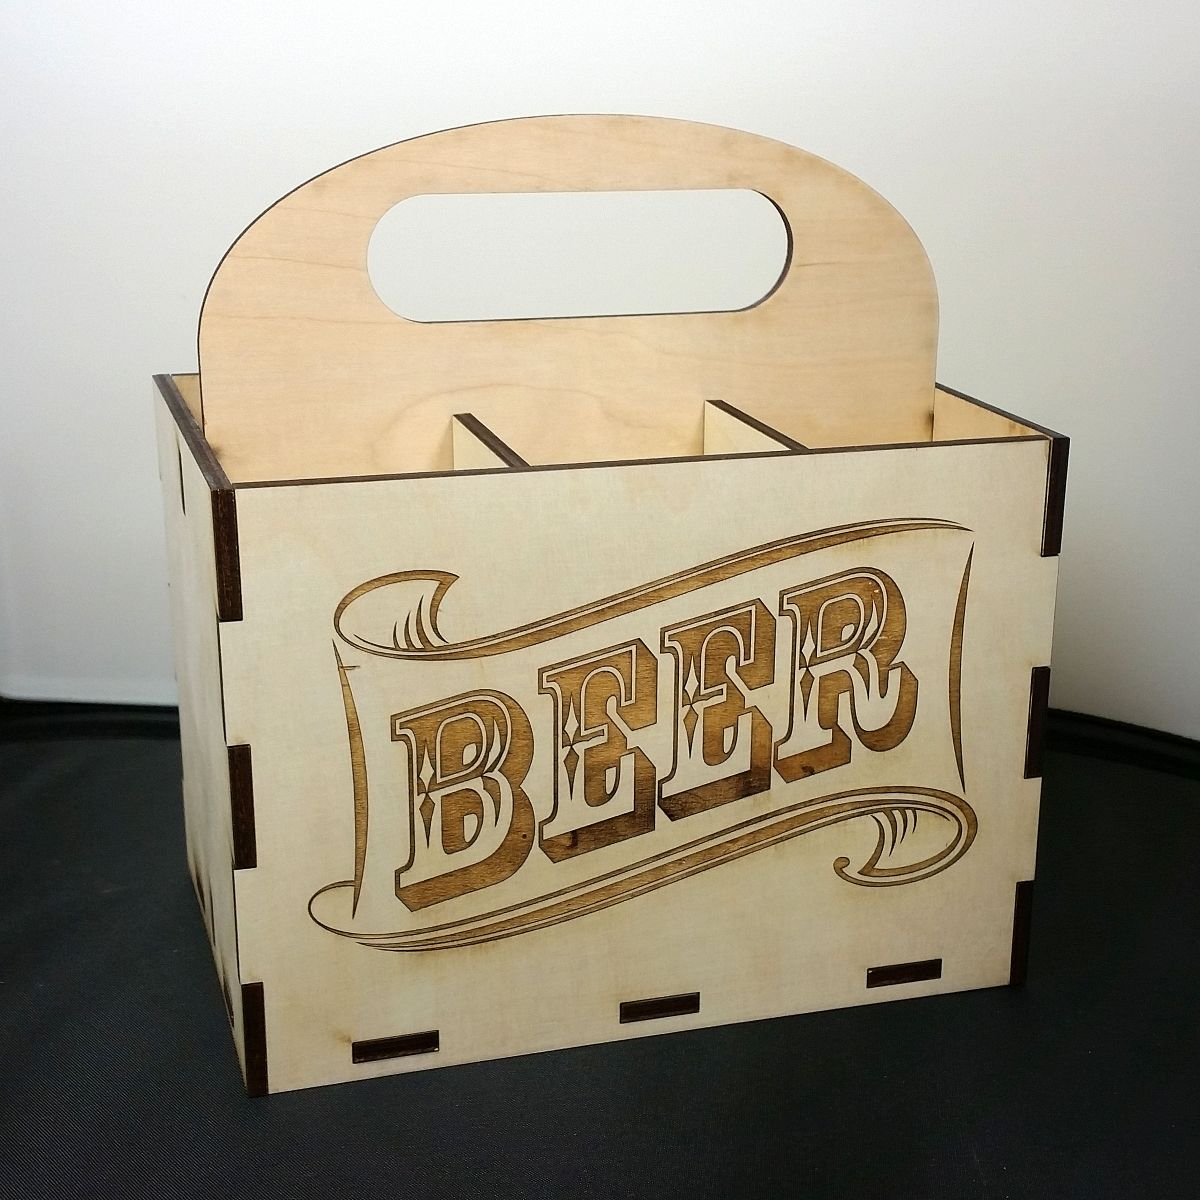 Custom Wooden Laser Cut Beer Case By Nygaard Design